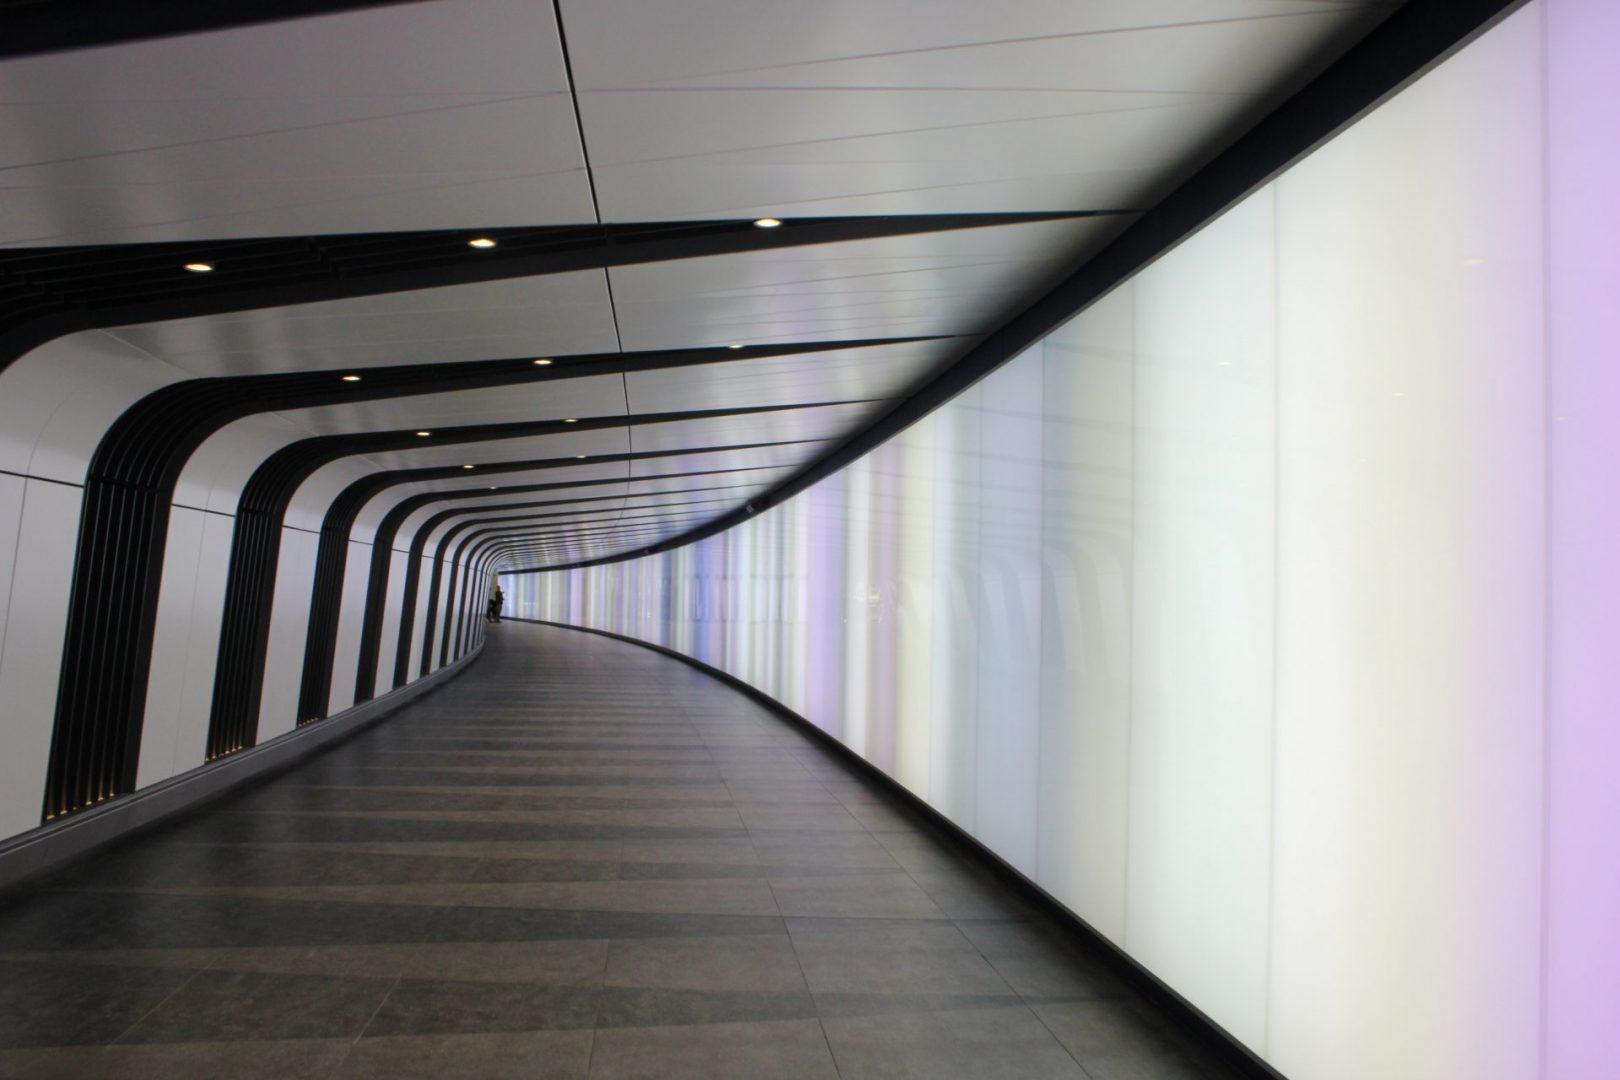 Kings Cross Tunnel Light Wall | specialist lighting installation | The Light Lab